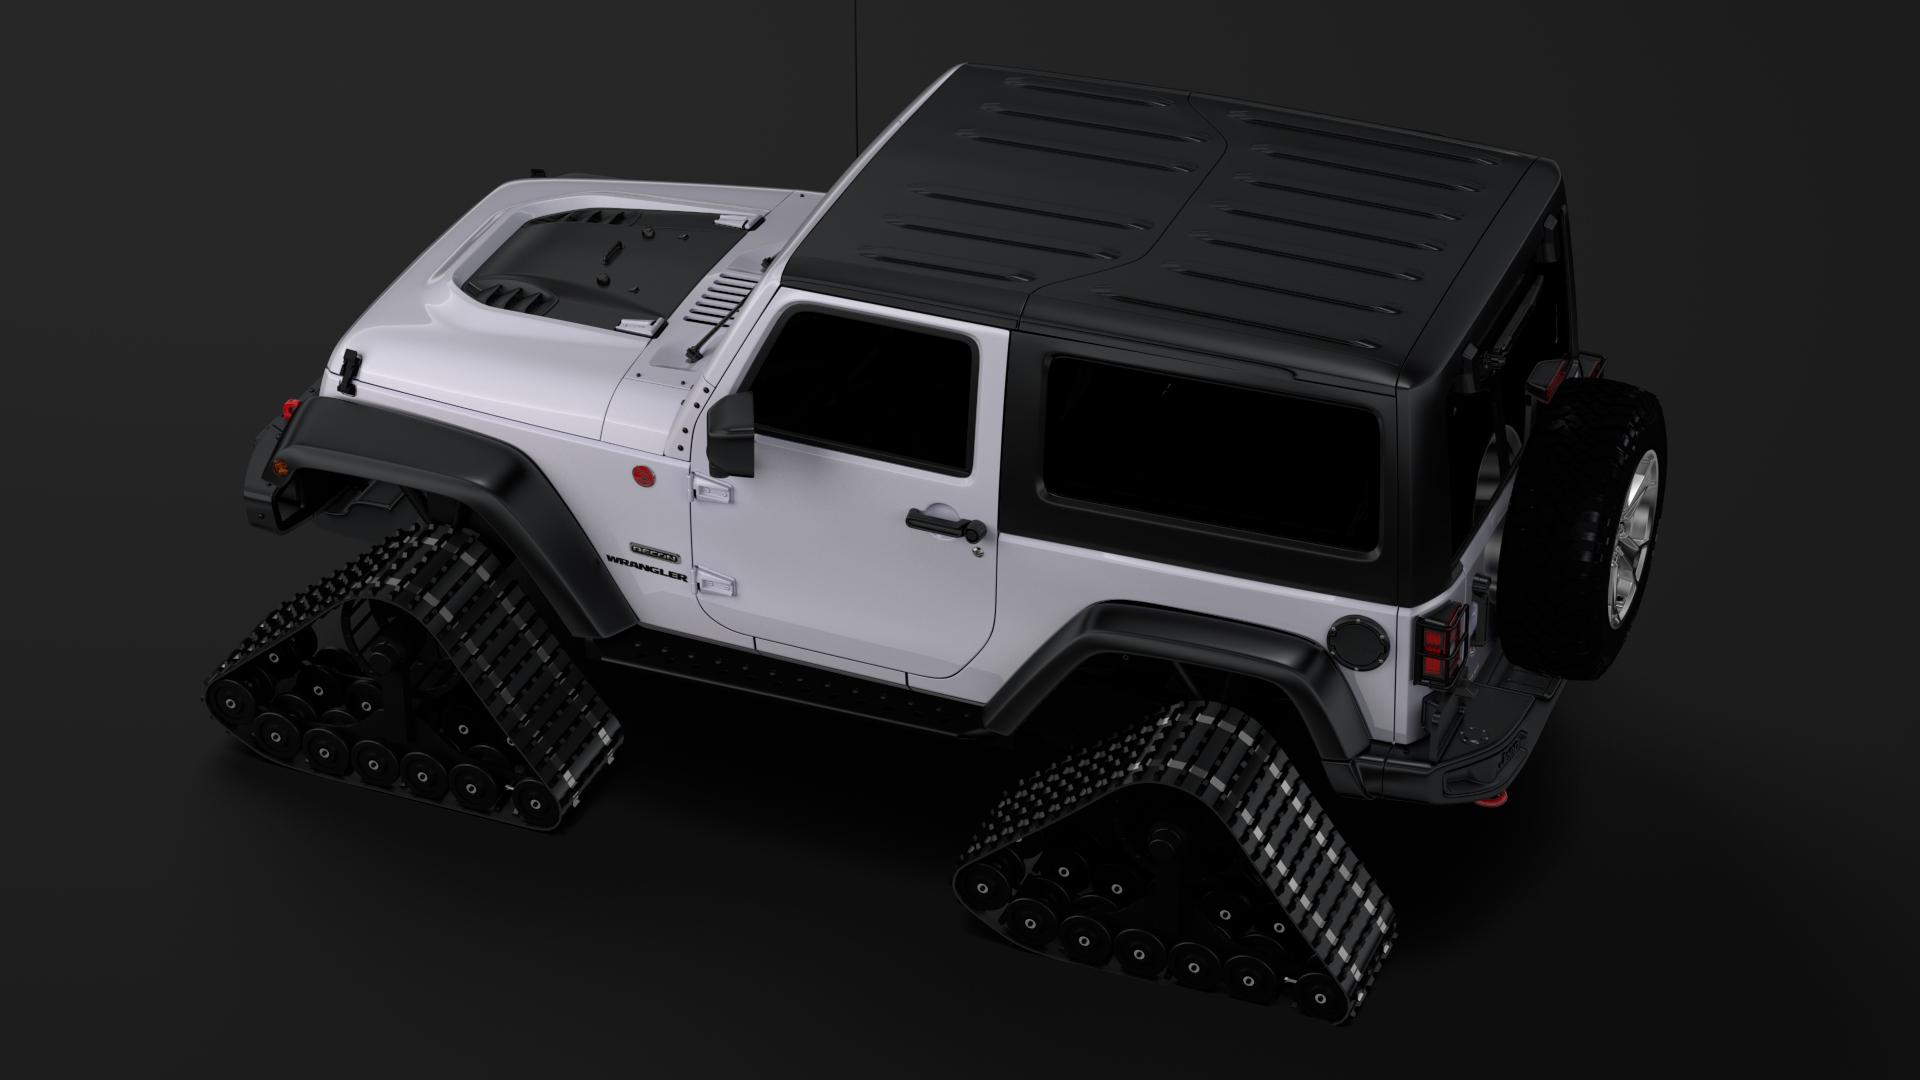 jeep wrangler crawler rubicon recon jk 2017 3d model max fbx c4d lwo ma mb hrc xsi obj 276919